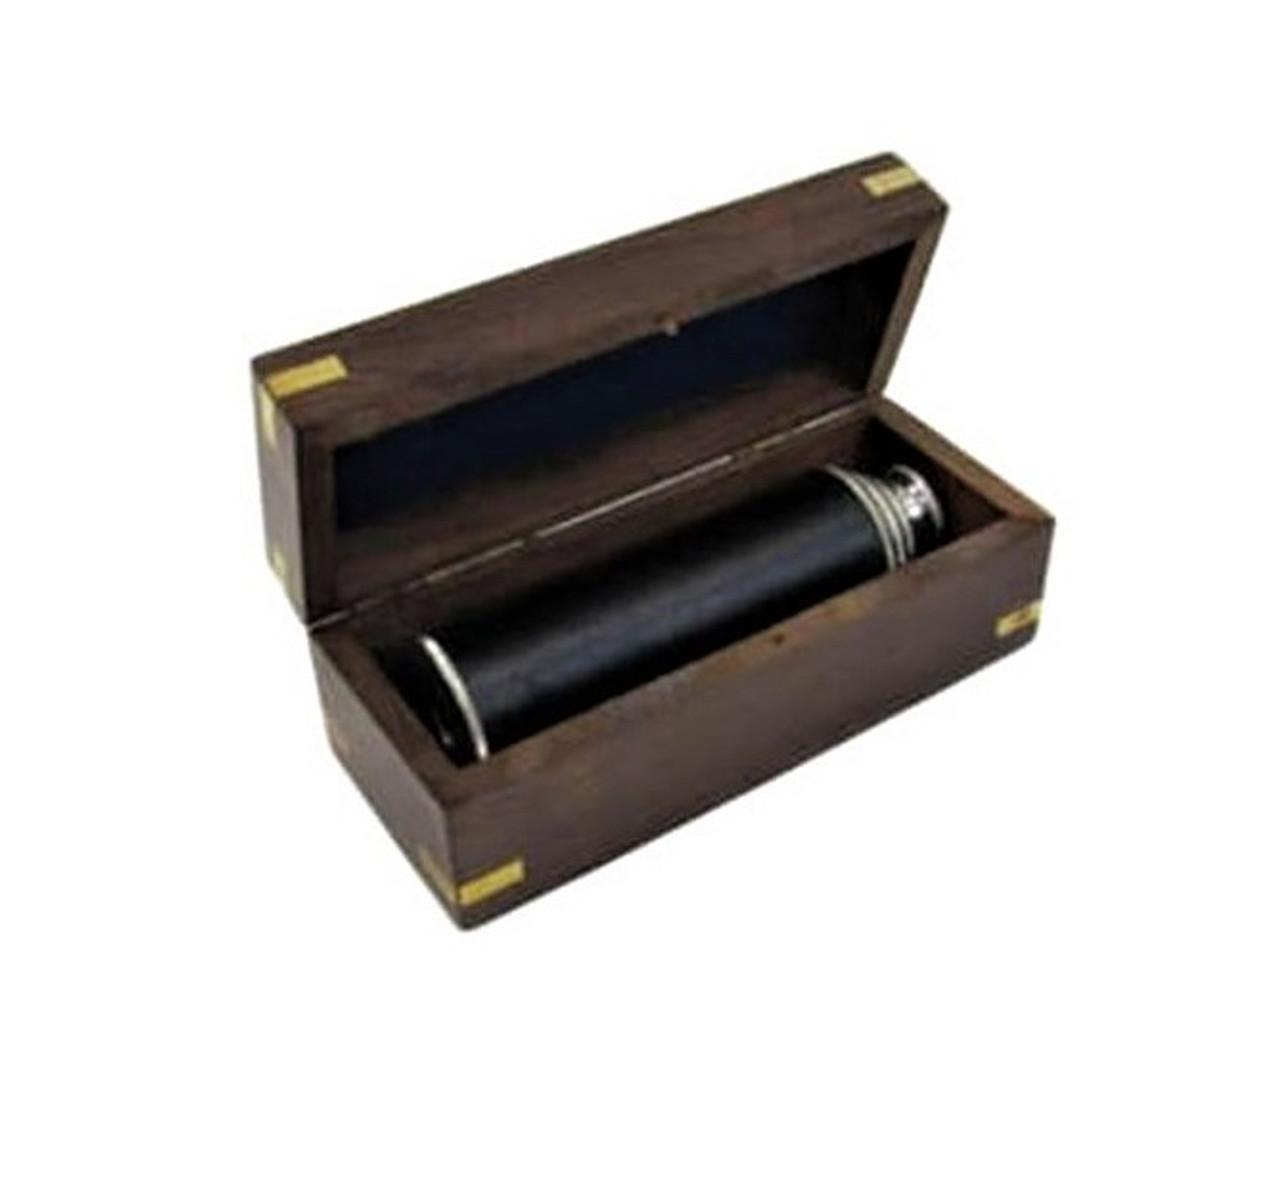 Pirate Spyglass Chrome Leather Wood Case Handheld Telescope